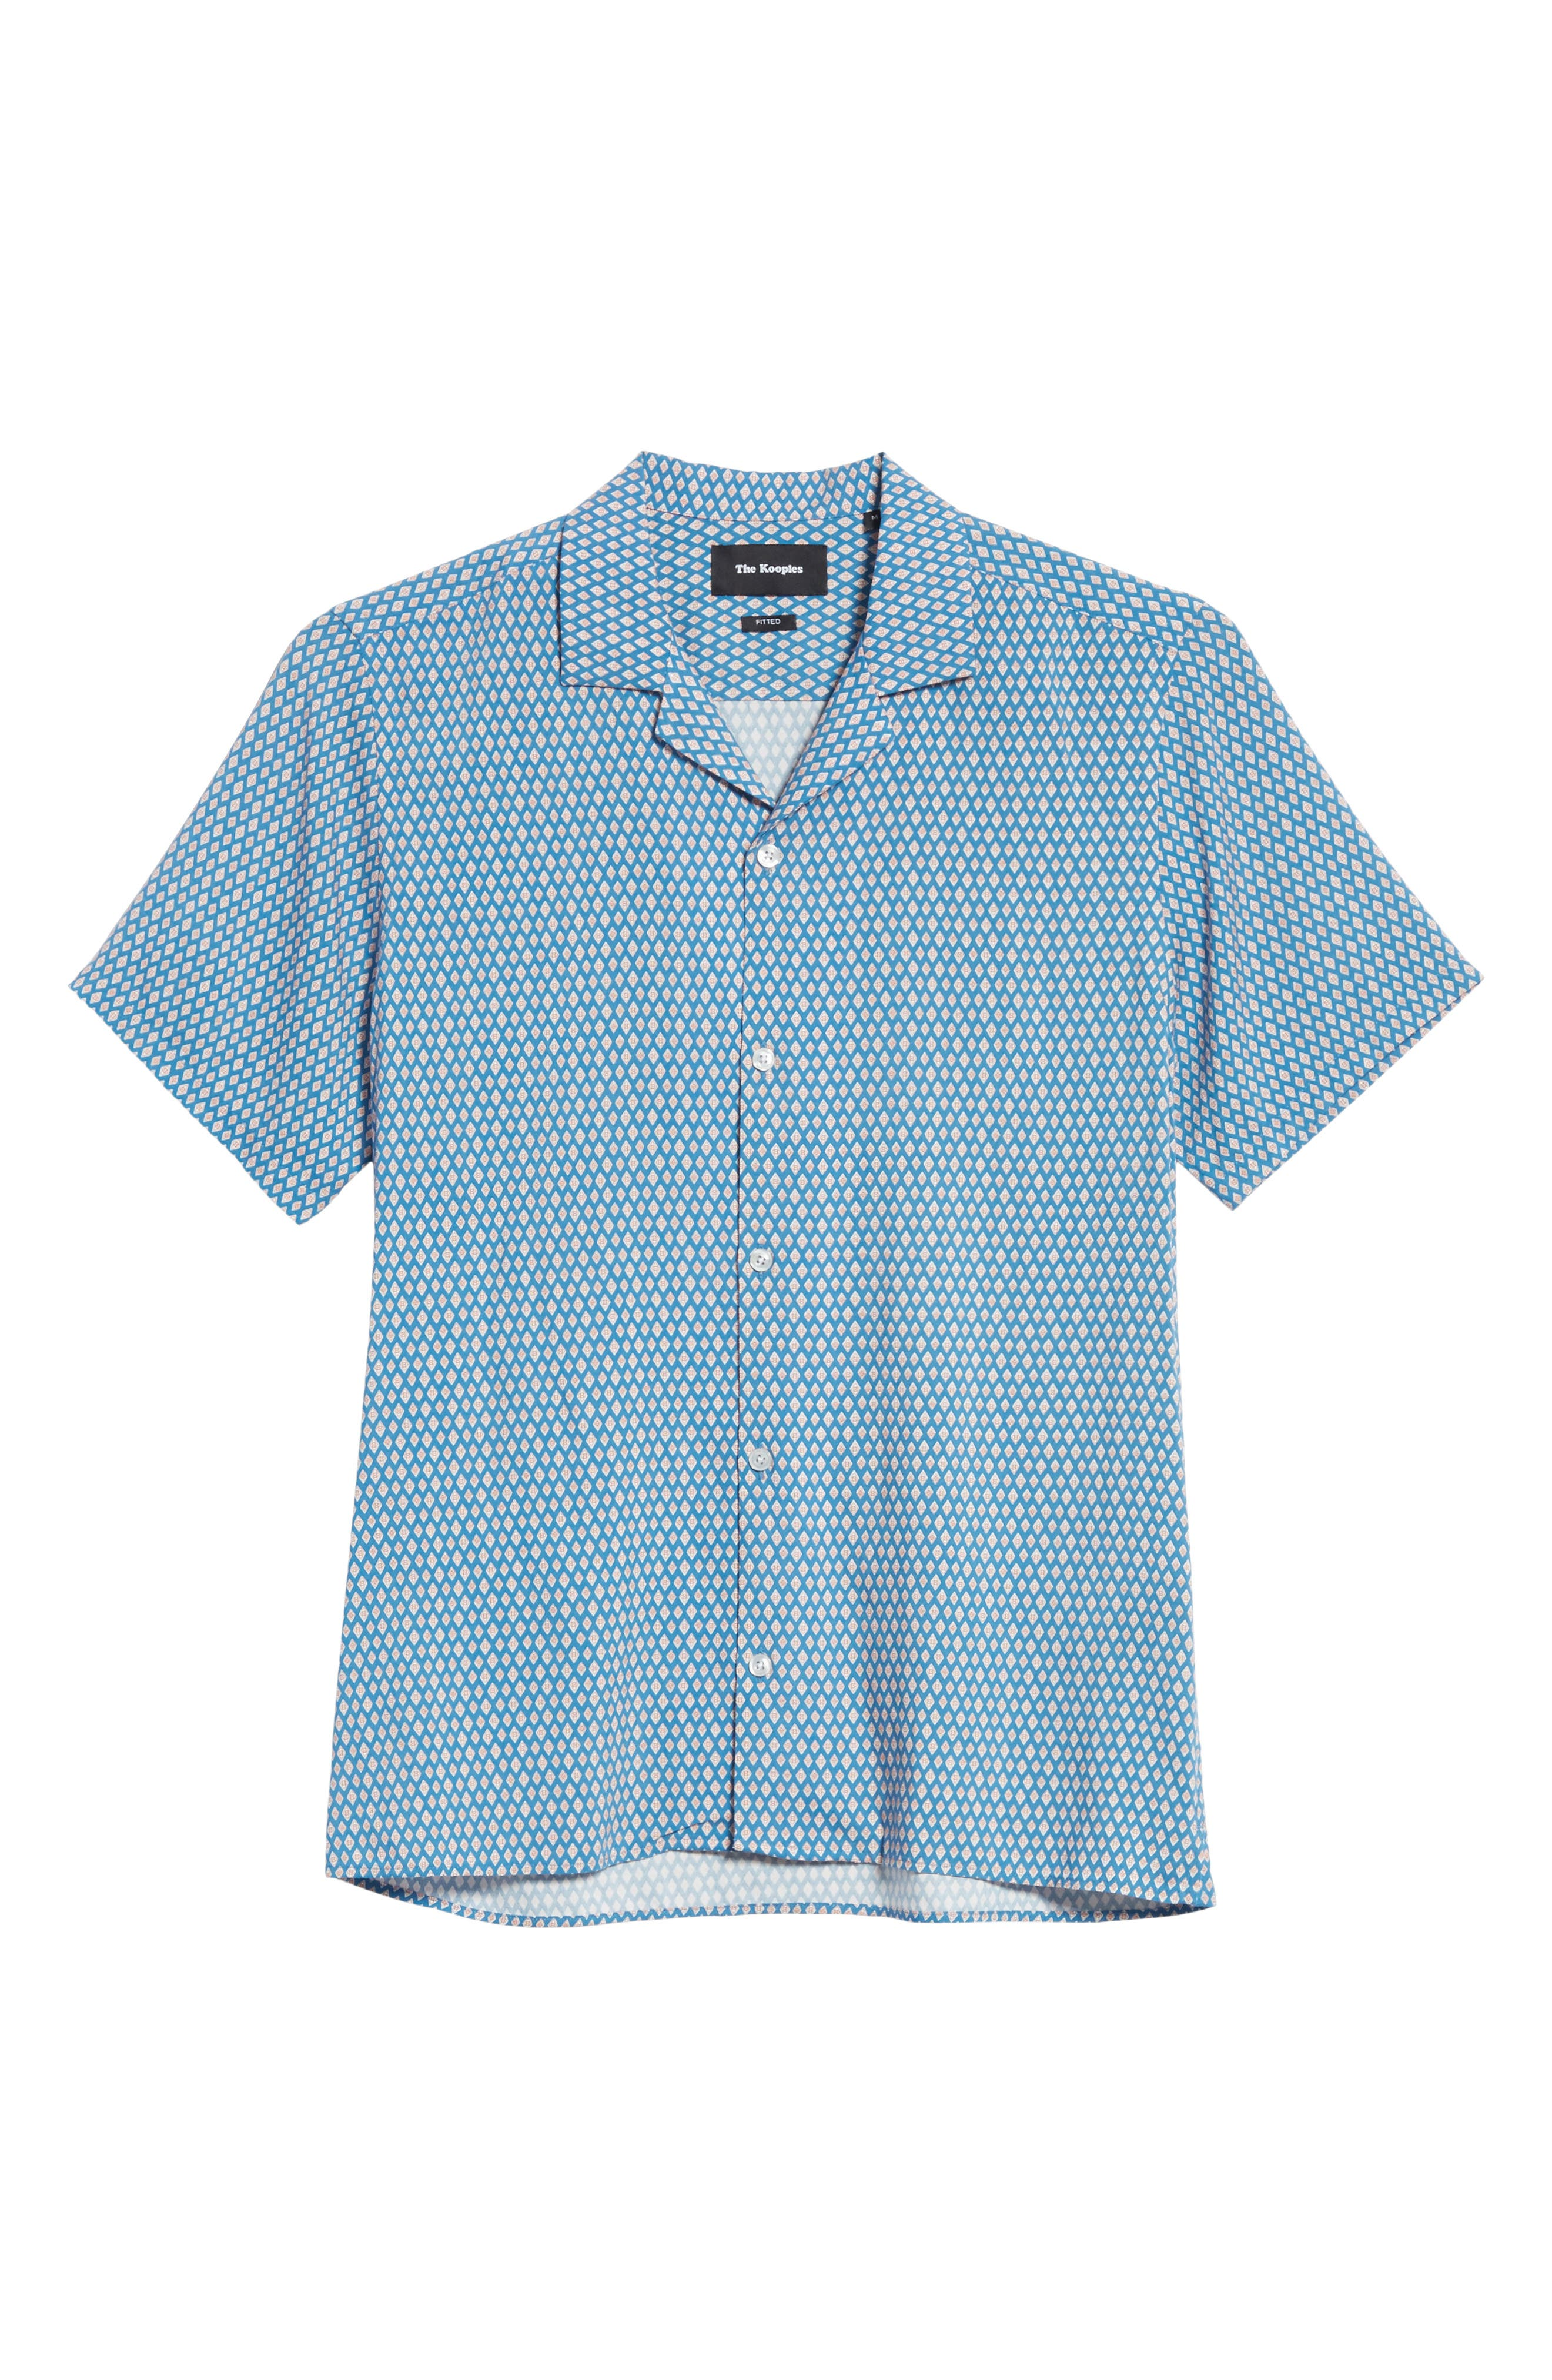 Diamond Print Camp Shirt,                             Alternate thumbnail 6, color,                             400